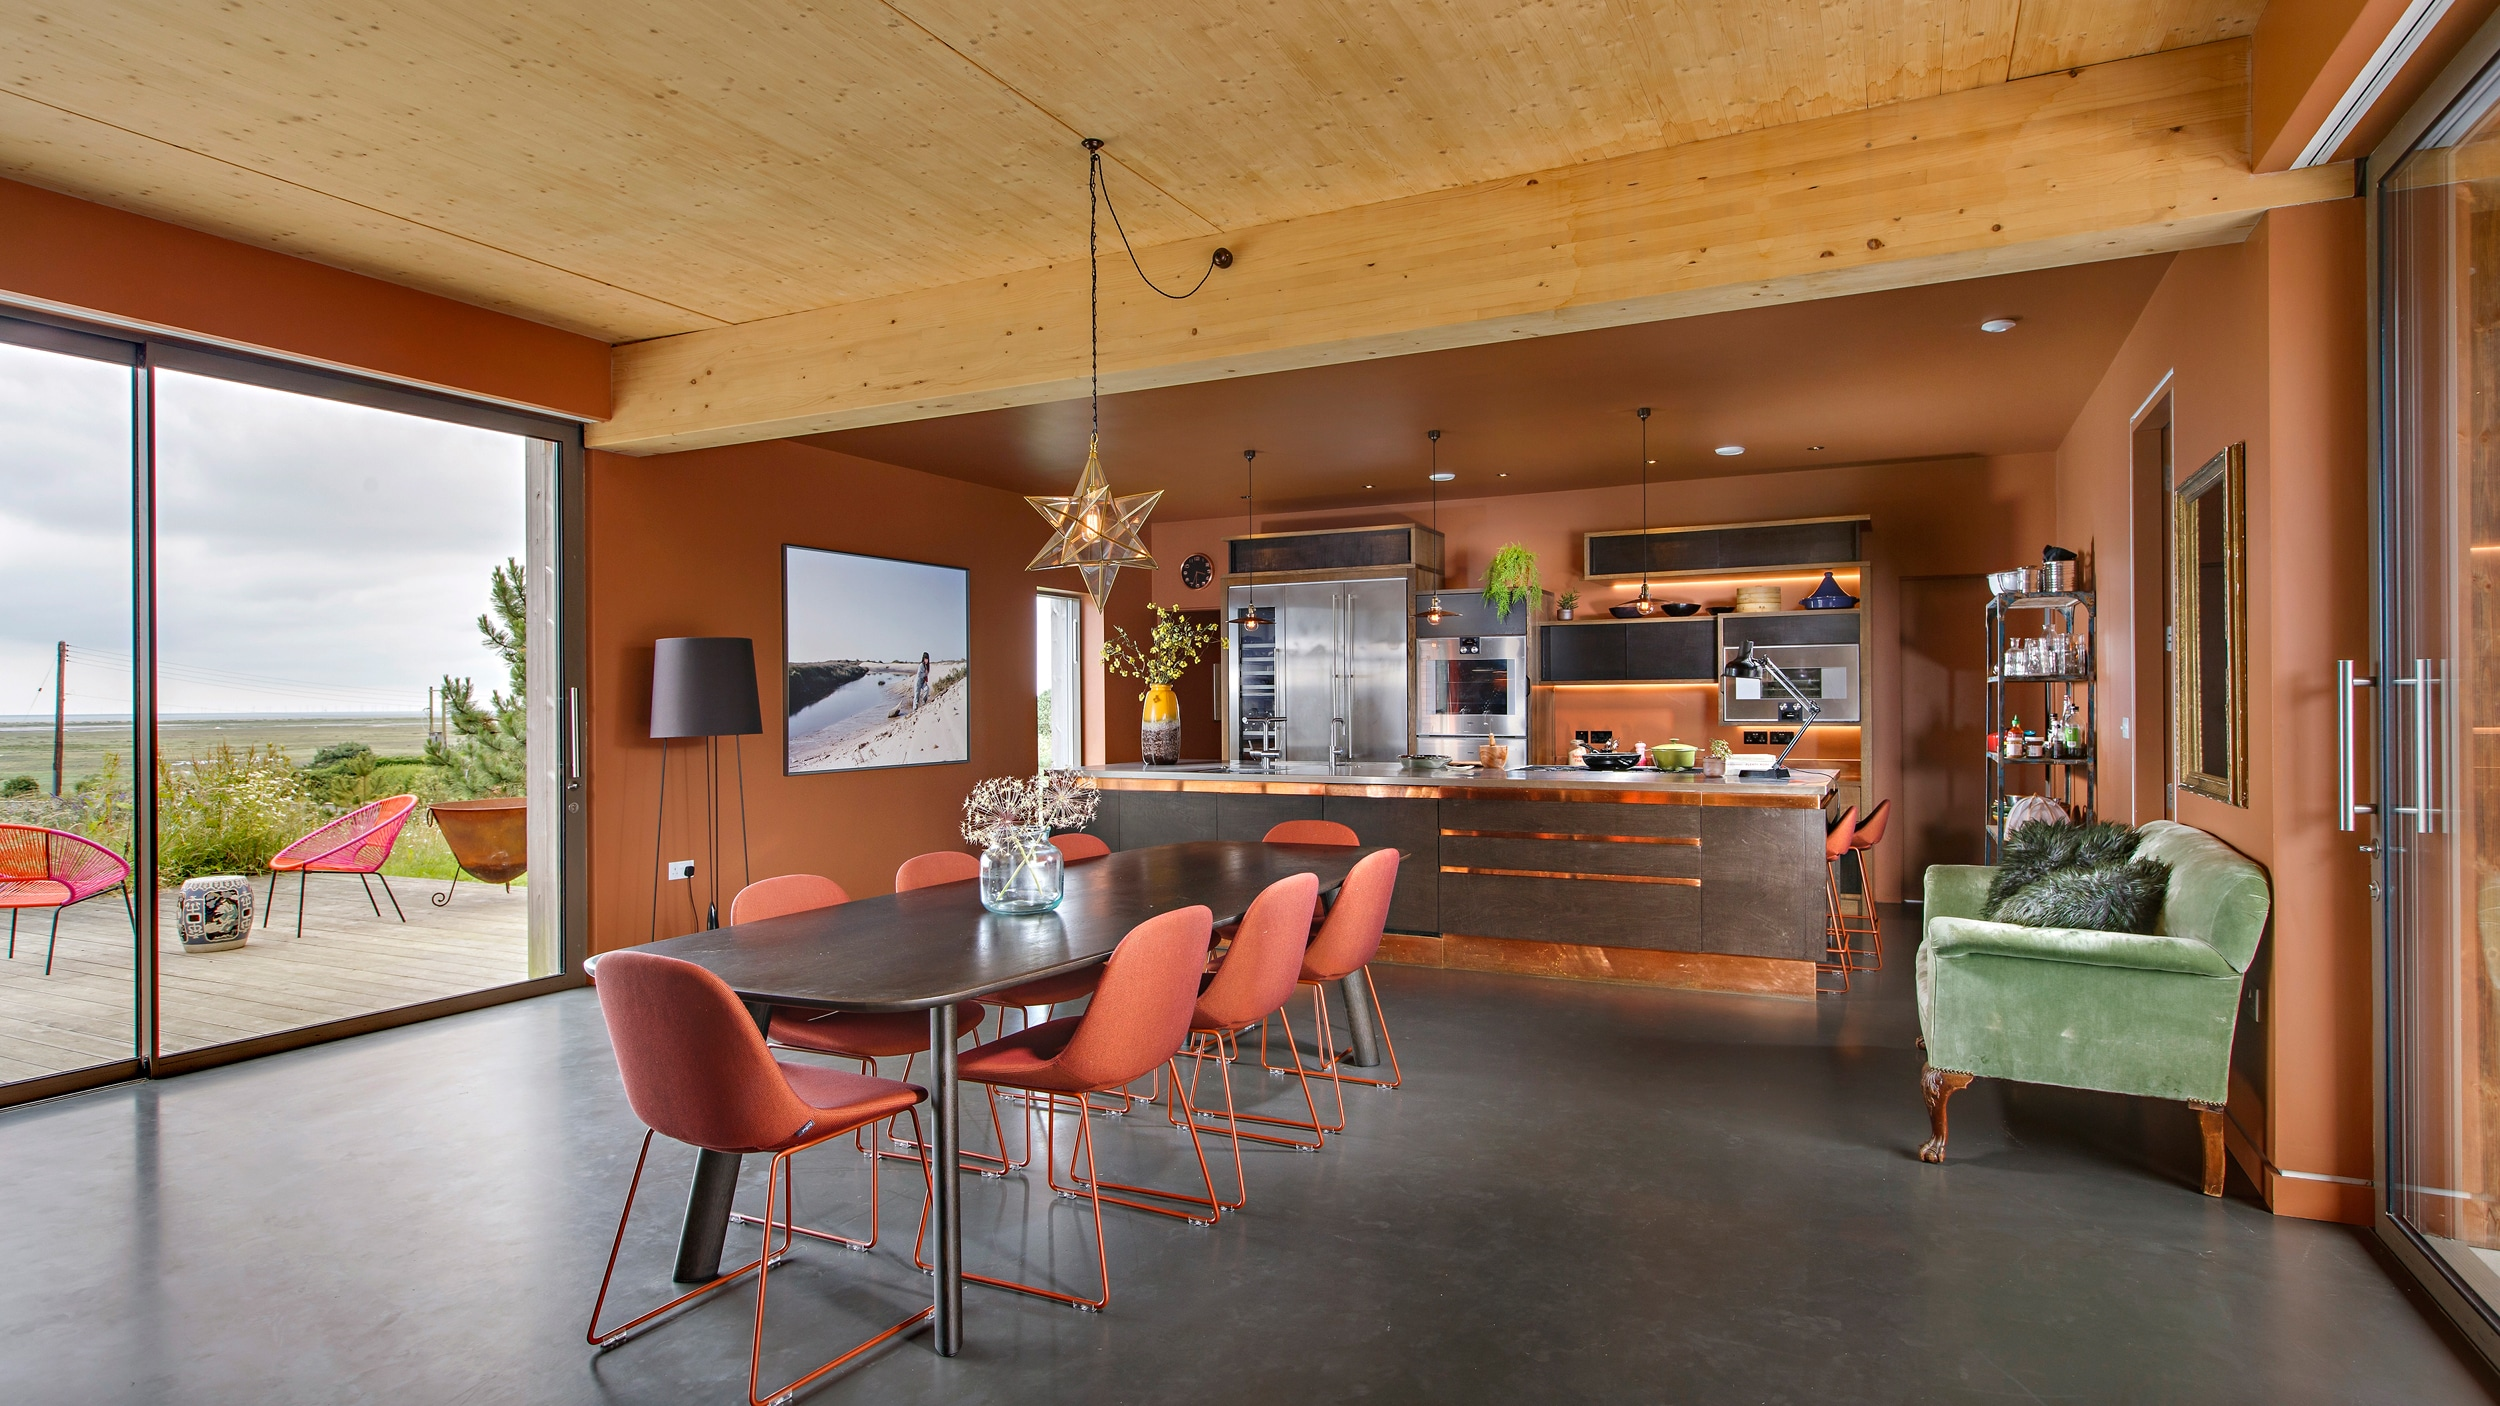 The stylish kitchen at Bliss Blakeney